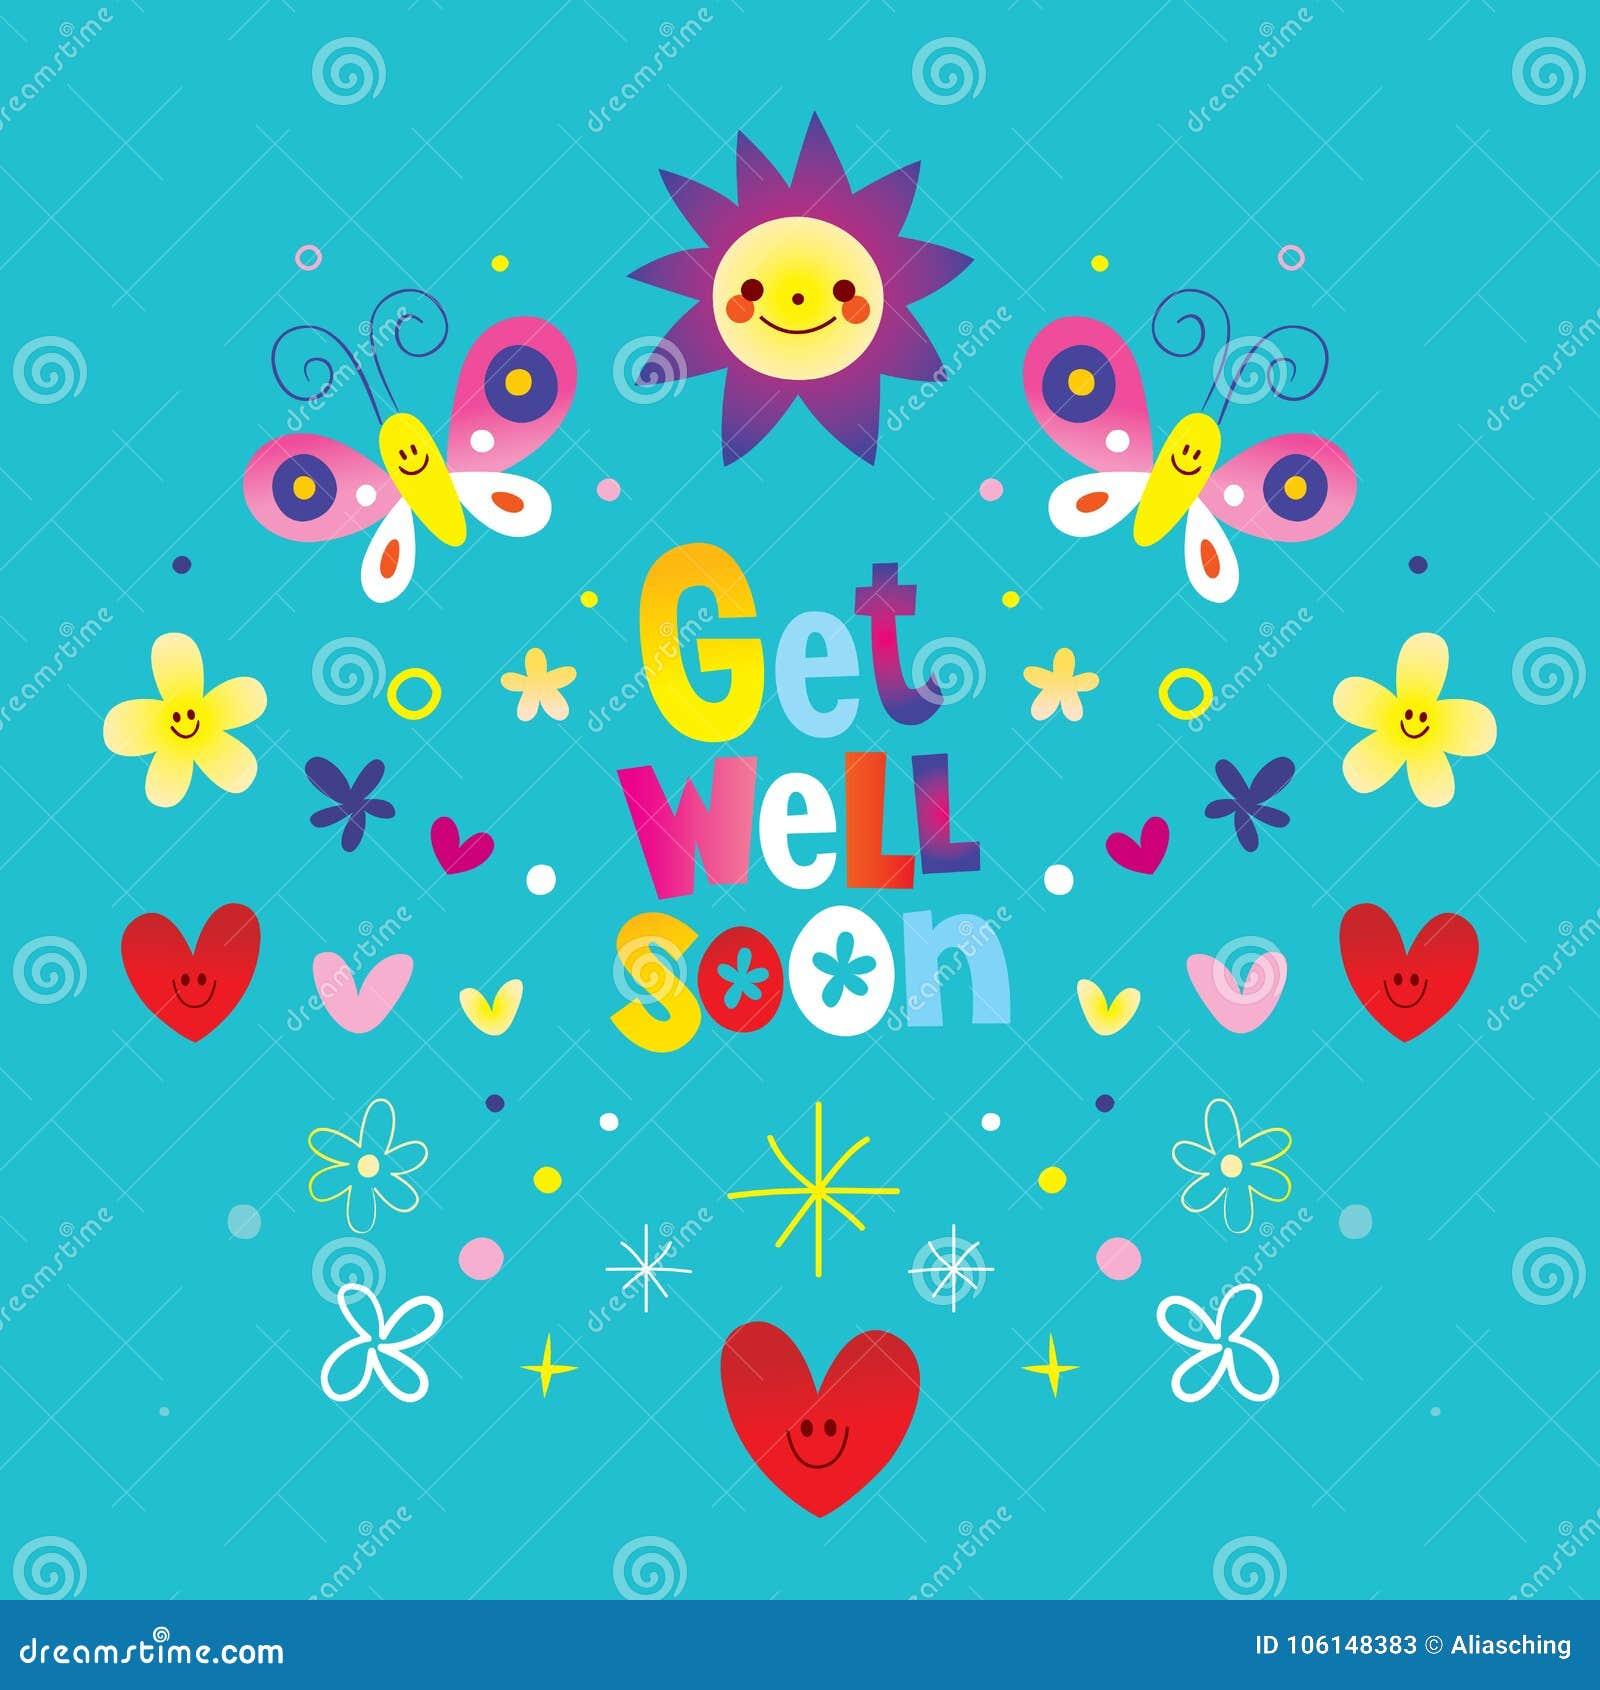 Get Well Soon Stock Vector Illustration Of Illness 106148383